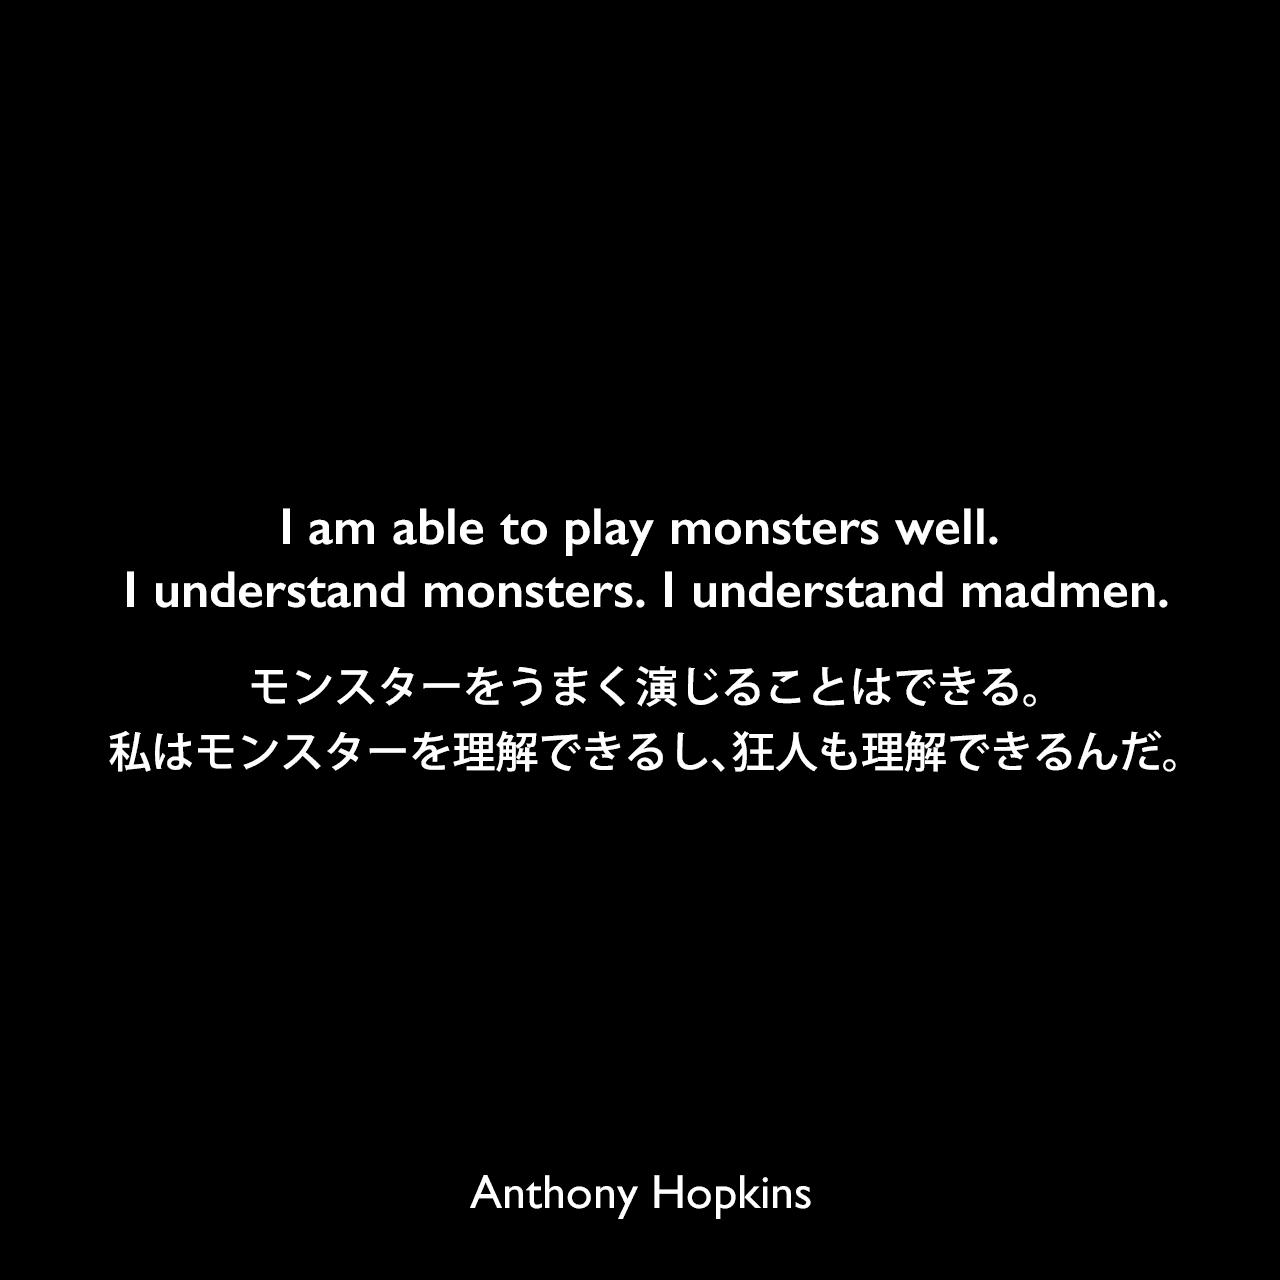 I am able to play monsters well. I understand monsters. I understand madmen.モンスターをうまく演じることはできる。私はモンスターを理解できるし、狂人も理解できるんだ。Anthony Hopkins